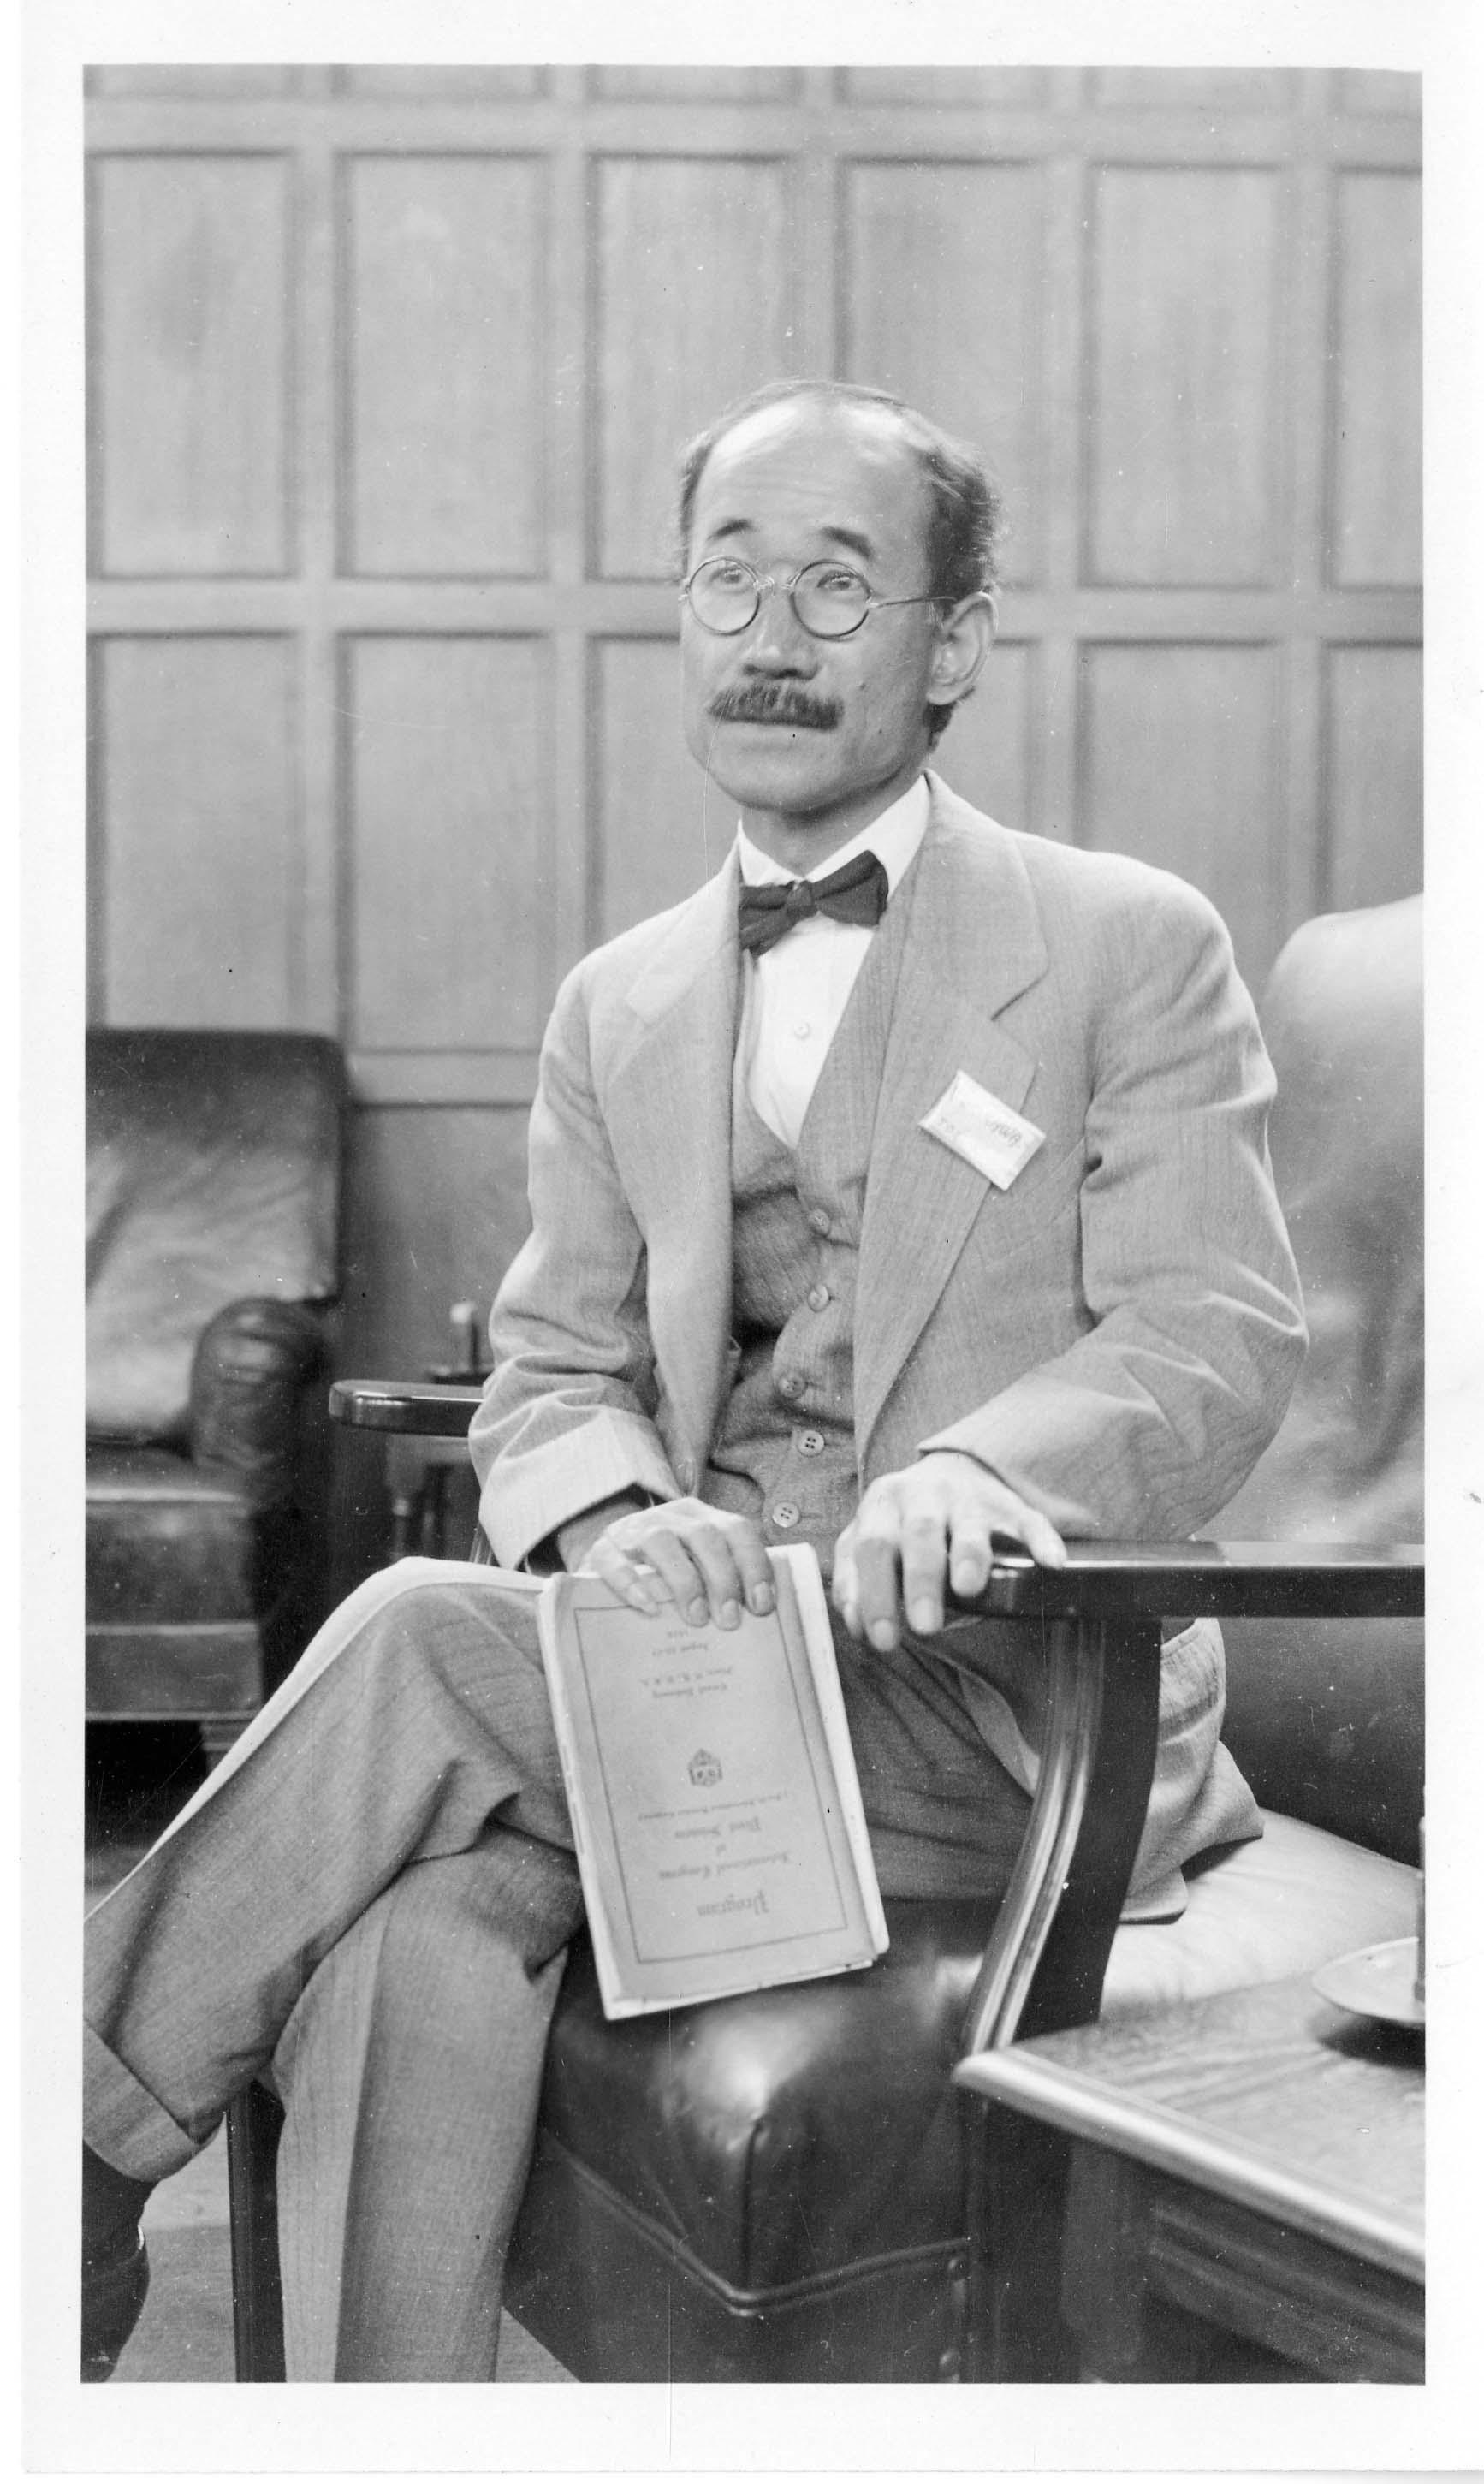 Mitsuhara Ishikawa, Japanese botanist and plant collector